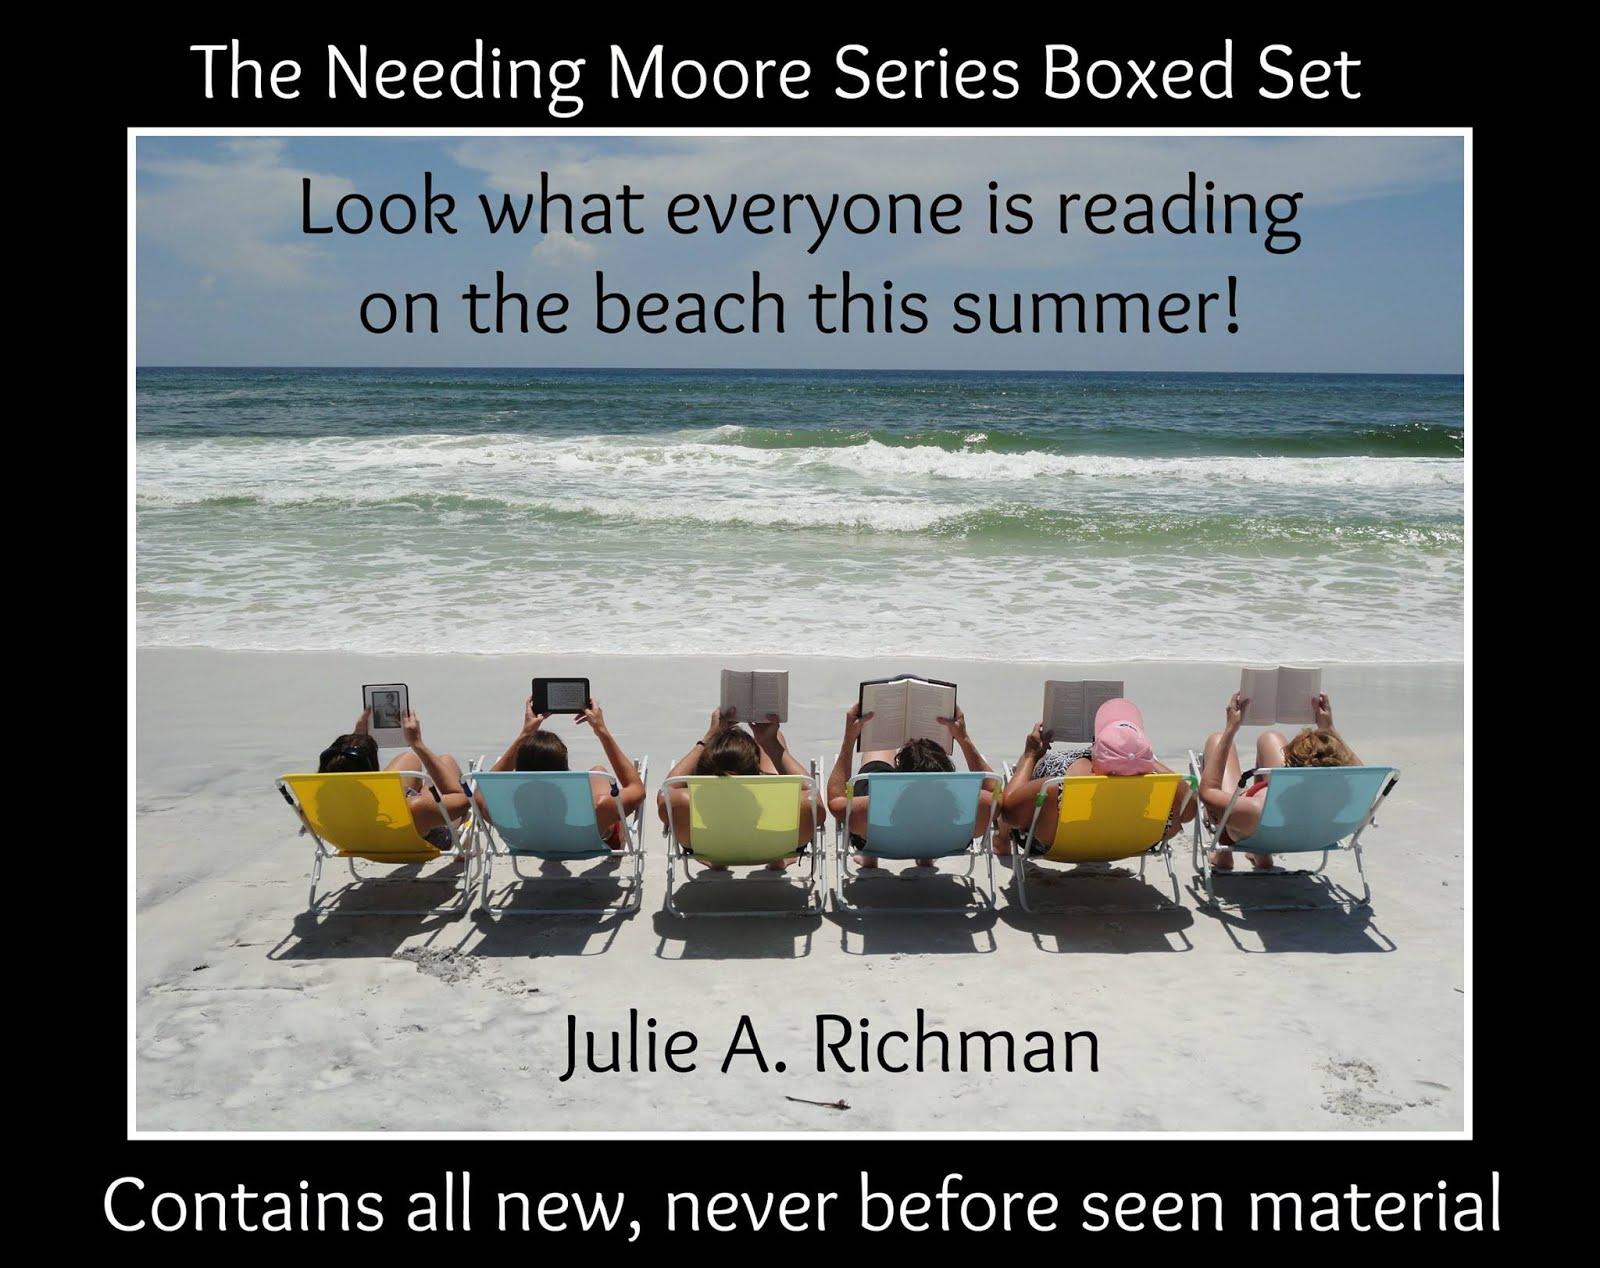 THE NEEDING MOORE BOX SET TEASER 1.jpg